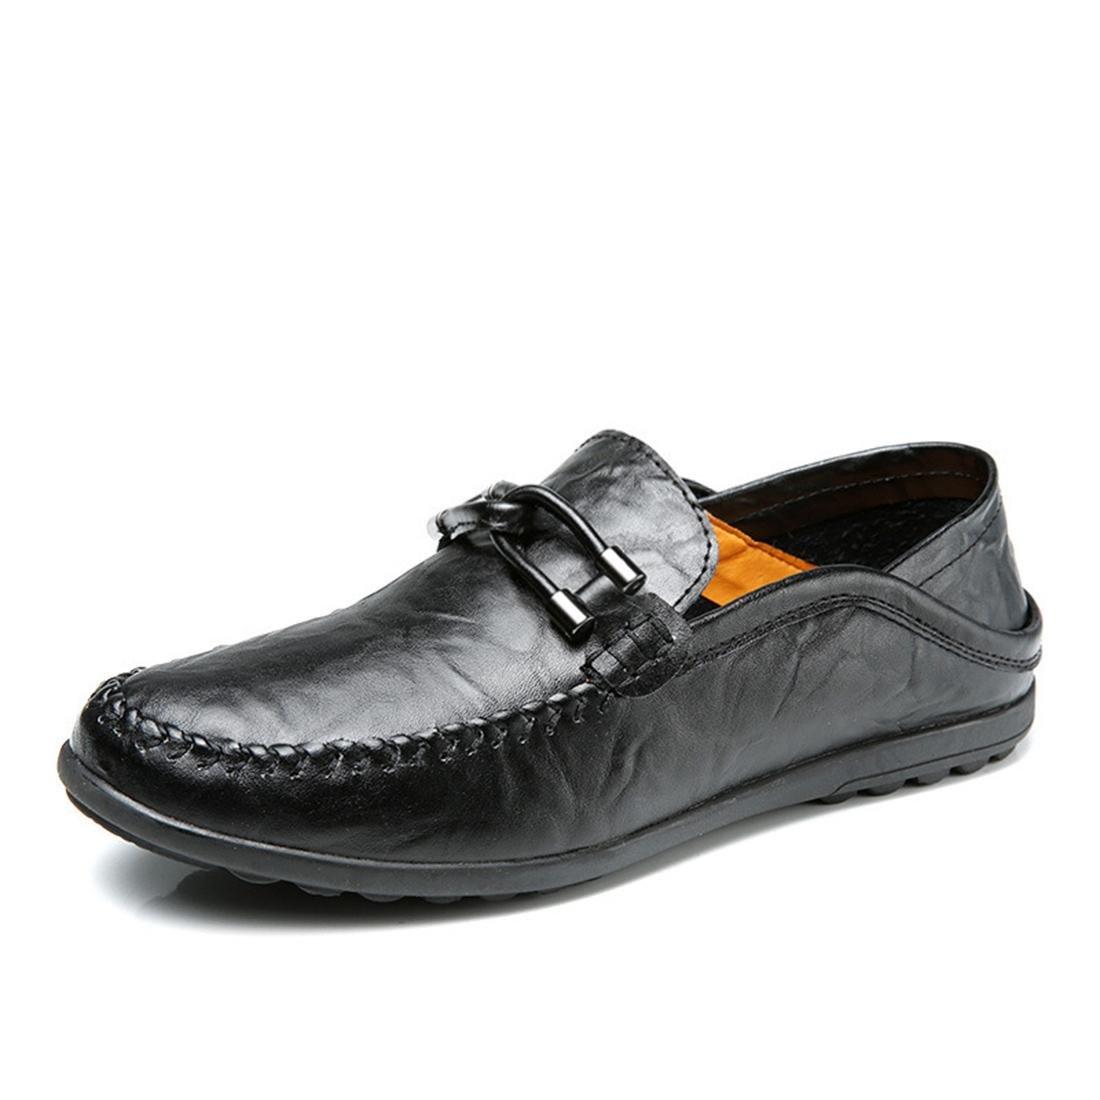 Herren Mode Freizeit Lederschuhe Flache Schuhe Lässige Schuhe Atmungsaktiv Rutschfest Flache Schuhe Zuhause Schlafzimmer EUR GRÖSSE 38-44